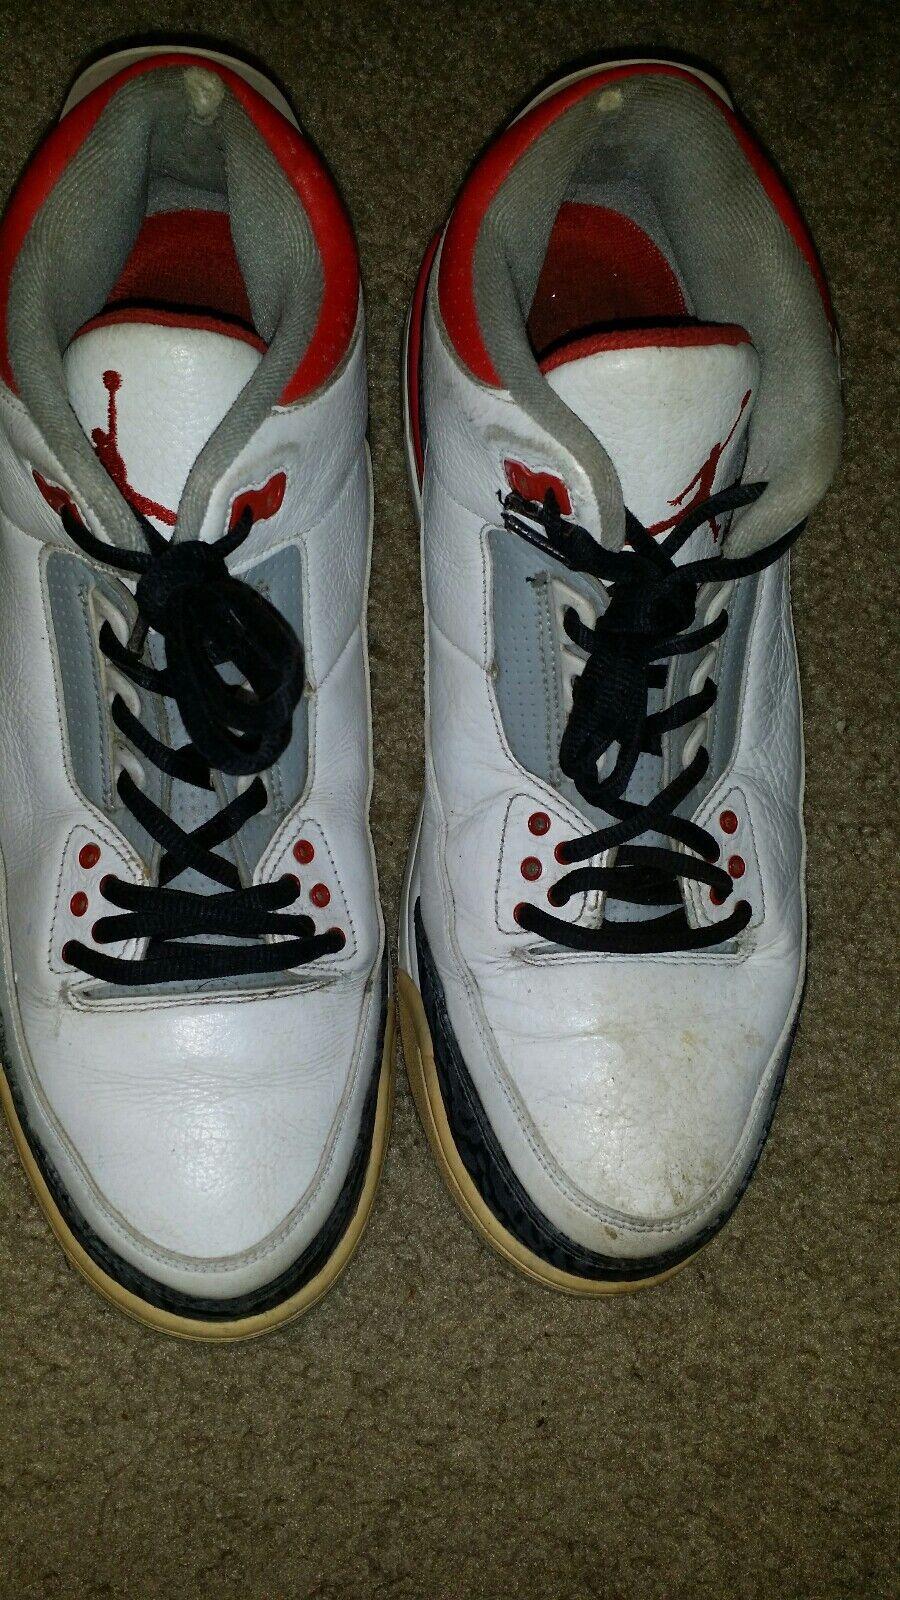 2013 Air Jordan Retro 3 Fire Red SIZE 11.5  136064-120 NO BOX